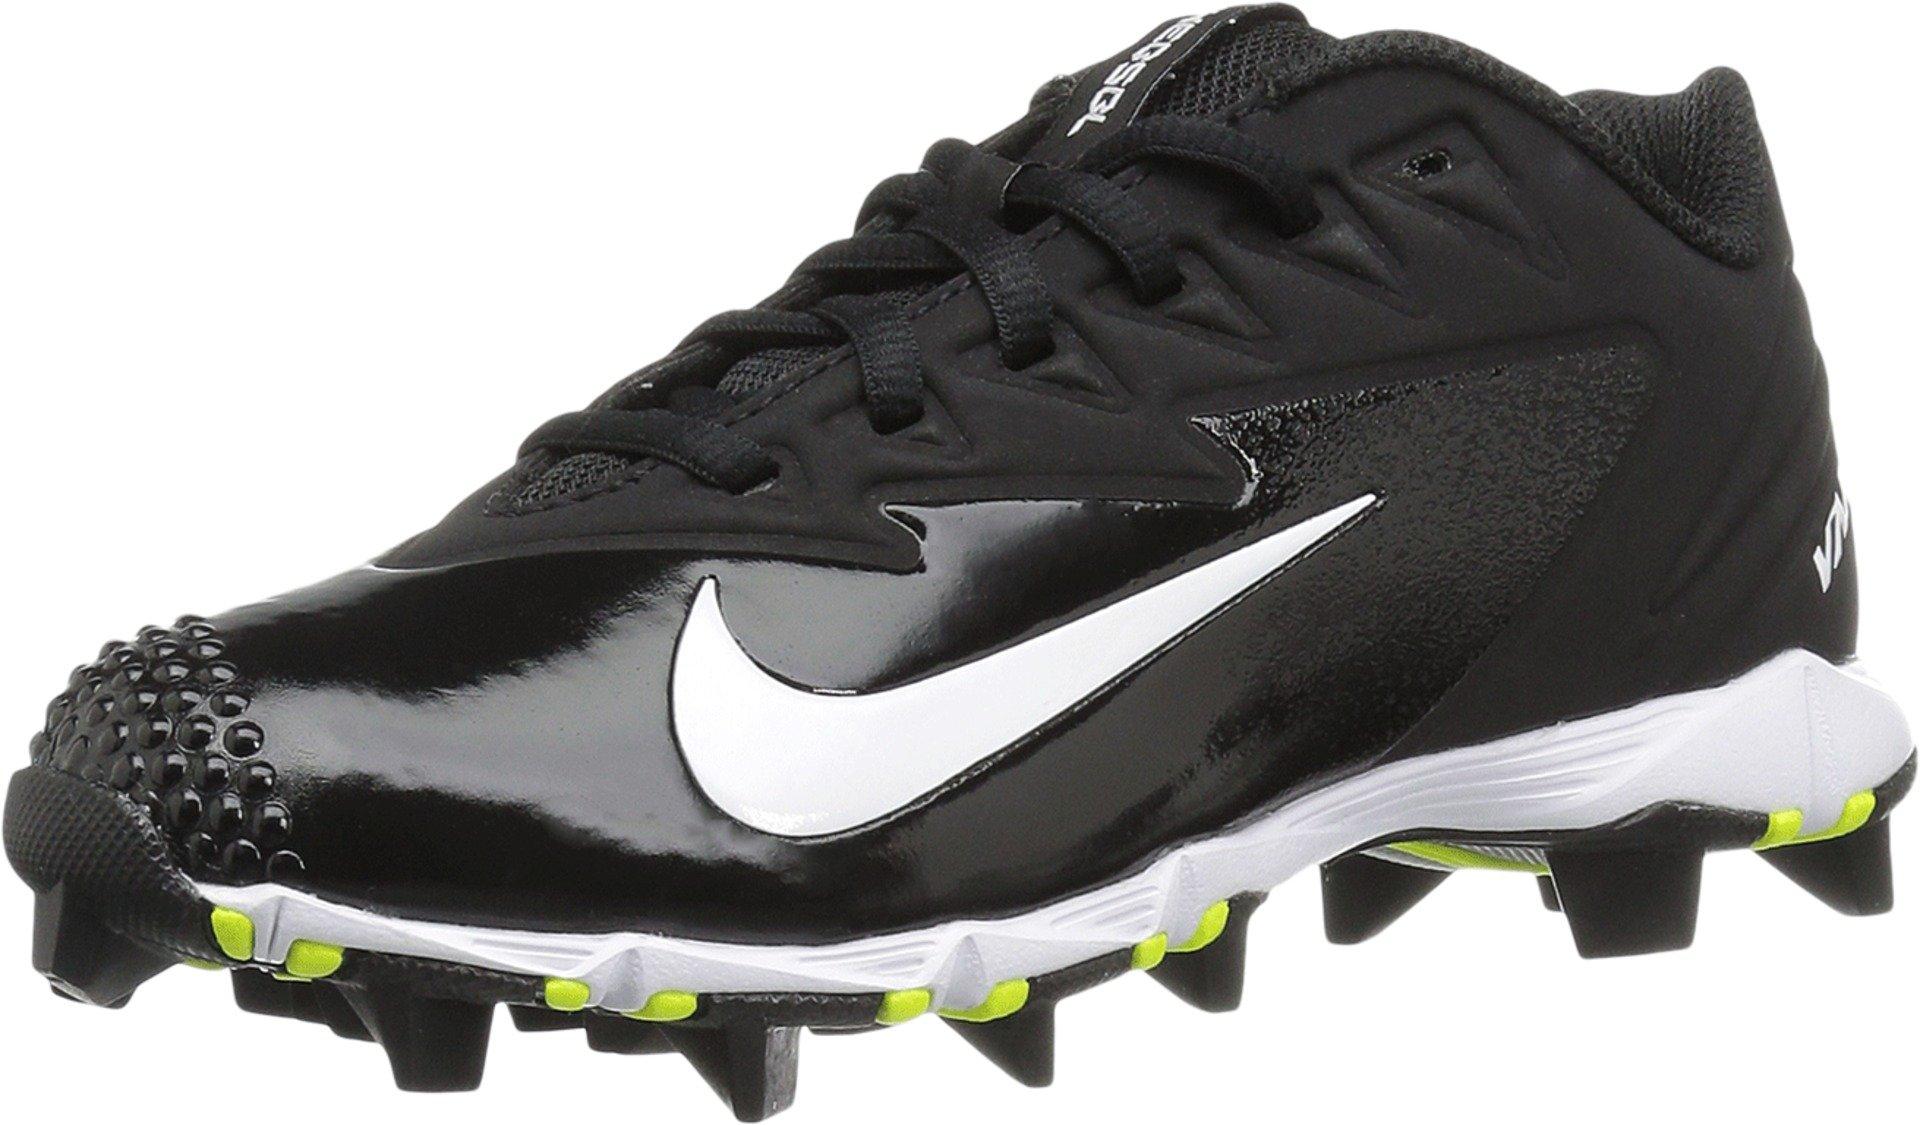 Nike Boys Vapor Ultrafly Keystone Cleat SZ 1.5 Black